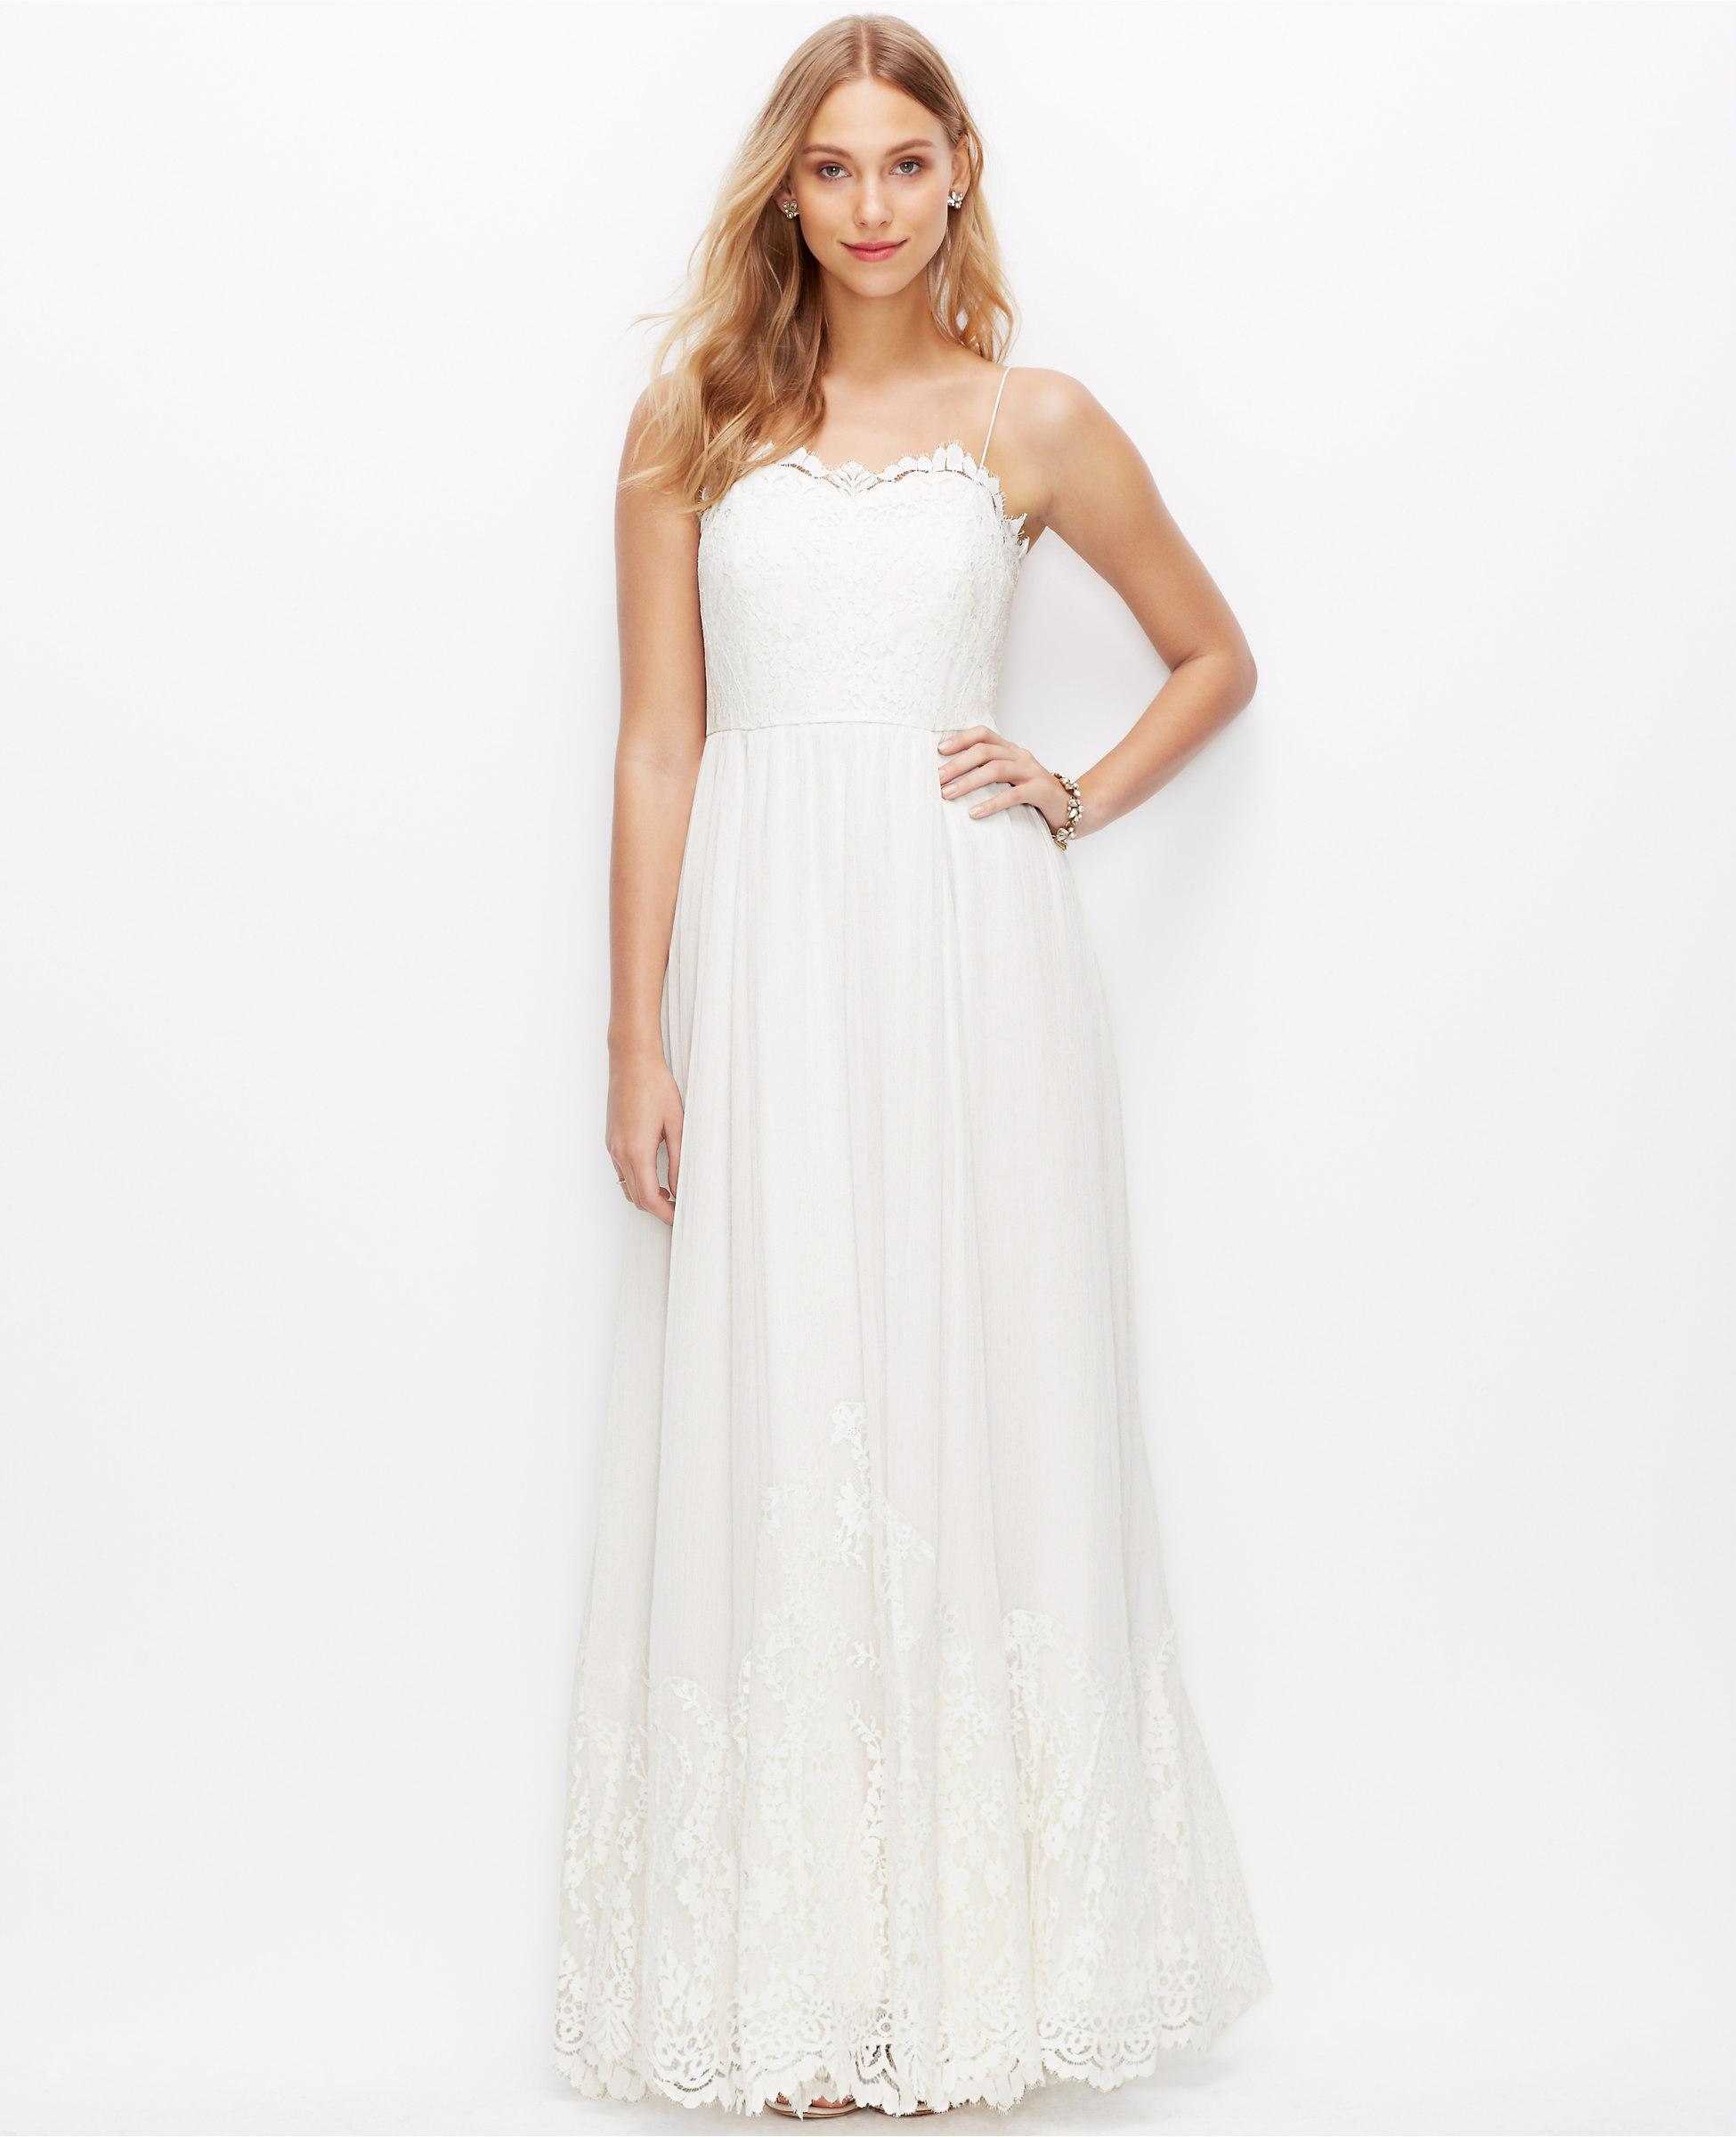 20 trendiest wedding dresses